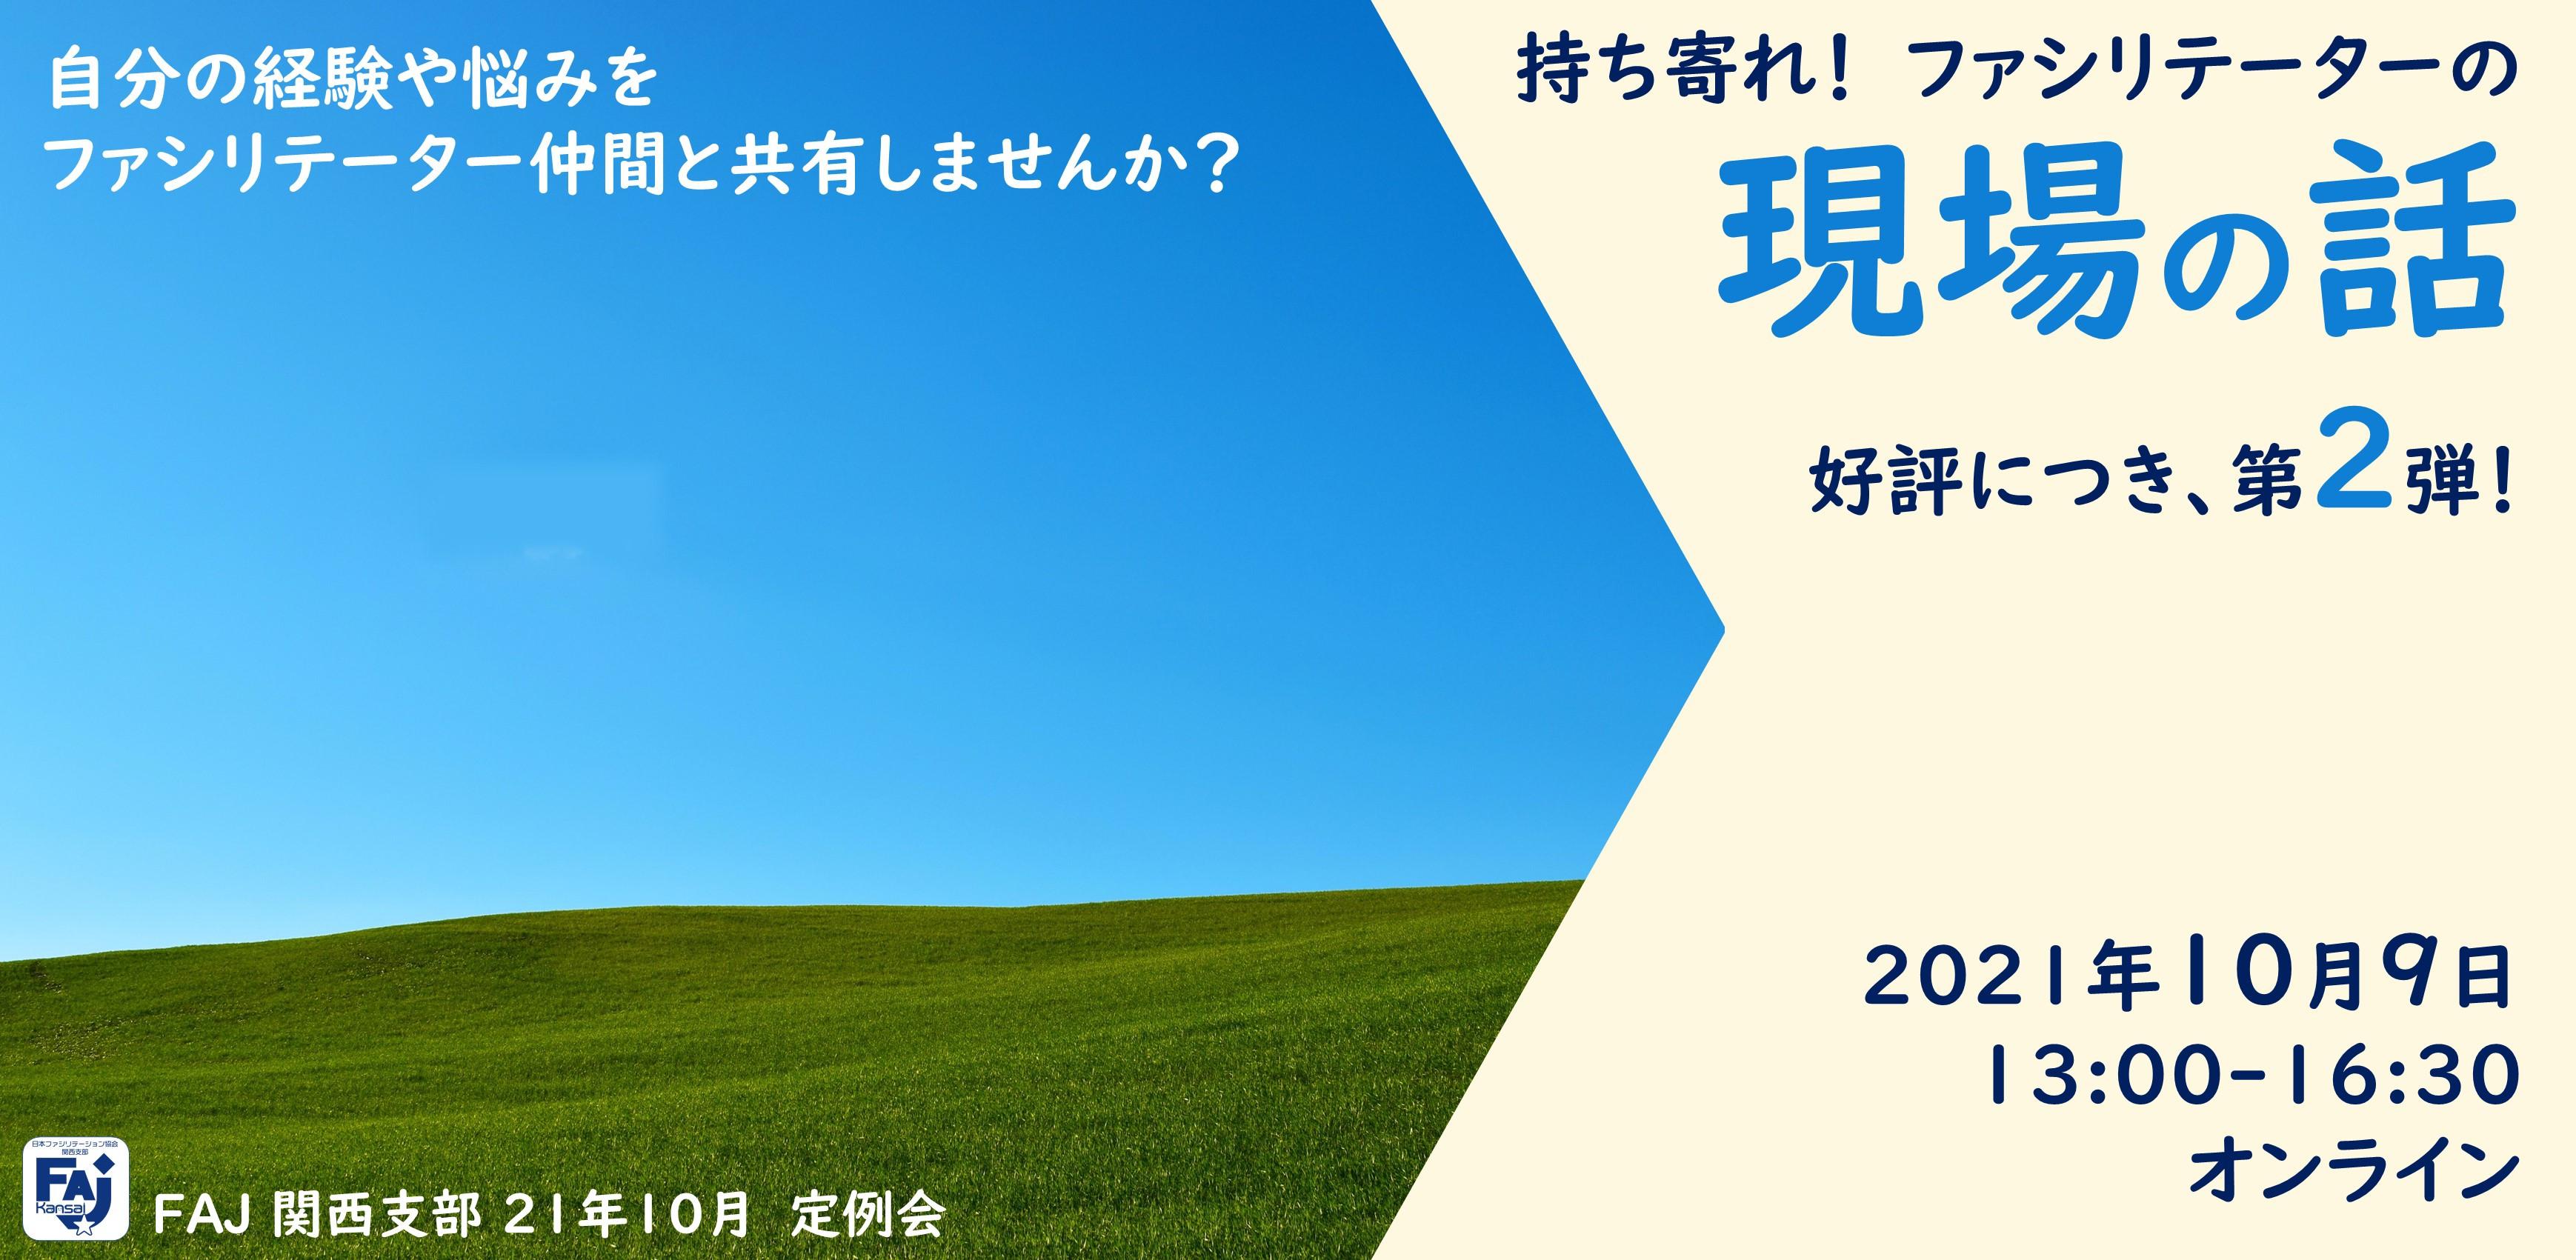 Peatix バナー 10月テーマ.jpg